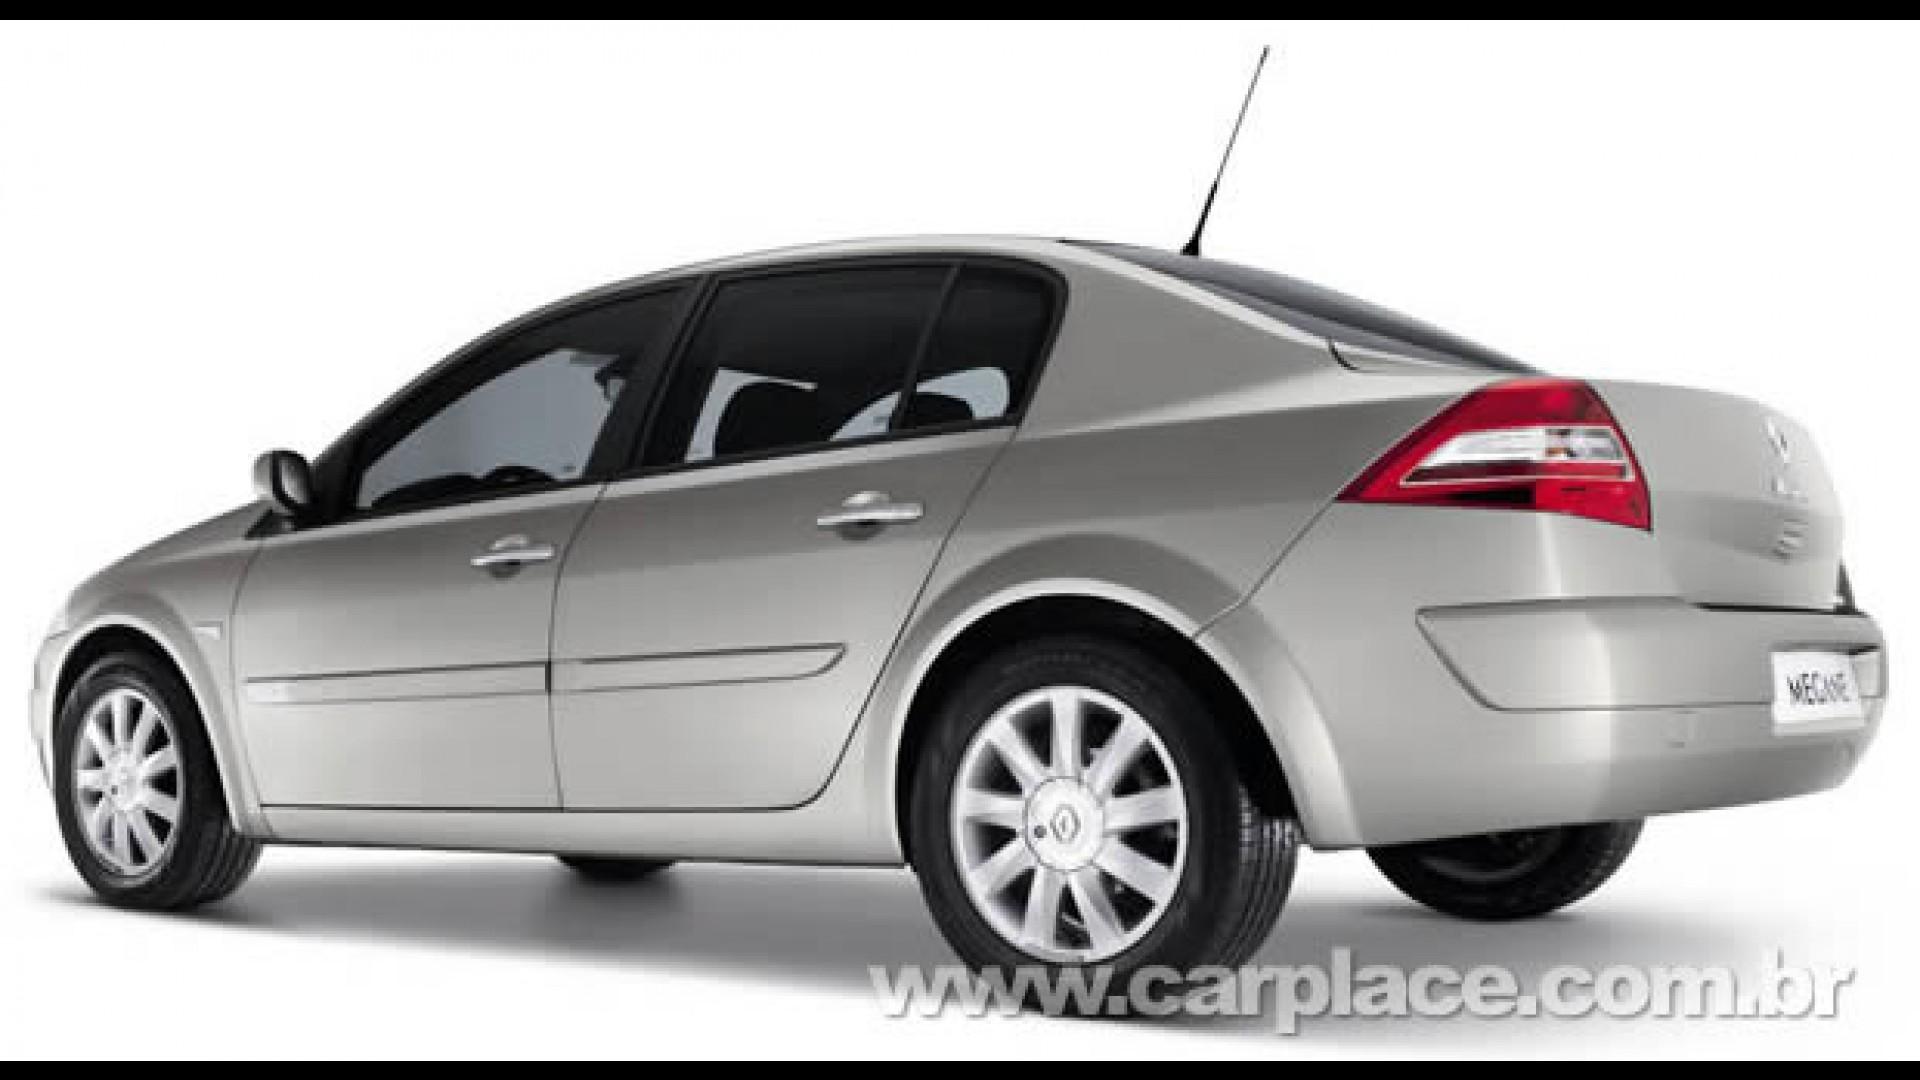 Arquivo Para Renault Megane Carplace